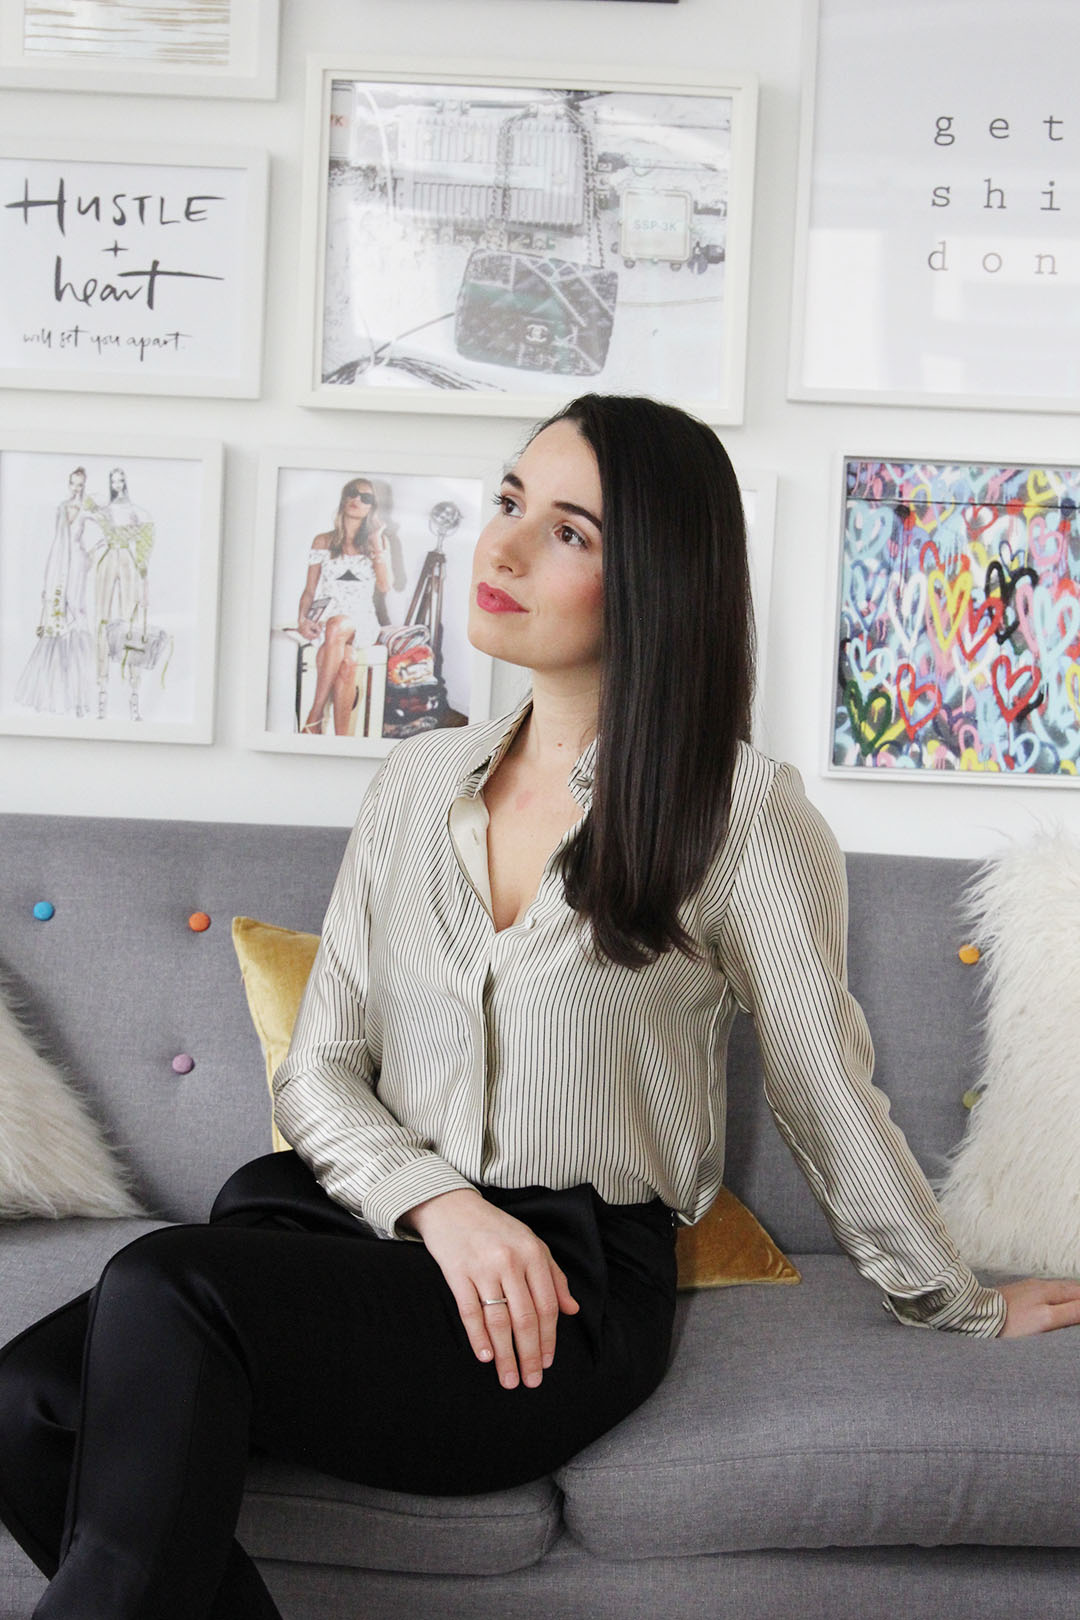 Village Luxe founder Julia Gudish Krieger